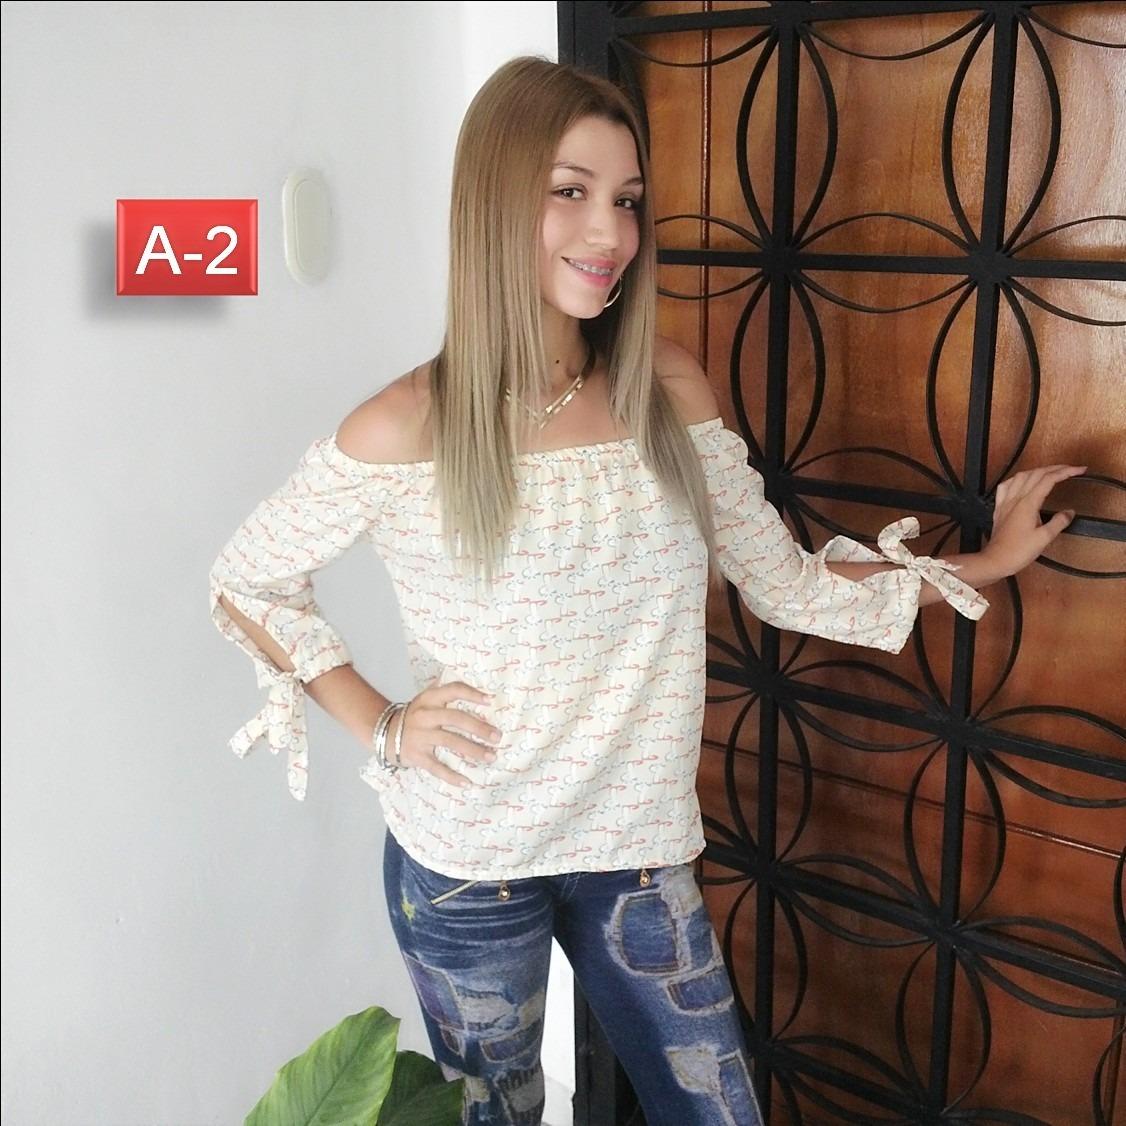 zoom gratis intima conjuntos mujer Cargando monos ev pijamas jogger ropa  6wPZz 7015c45747b8